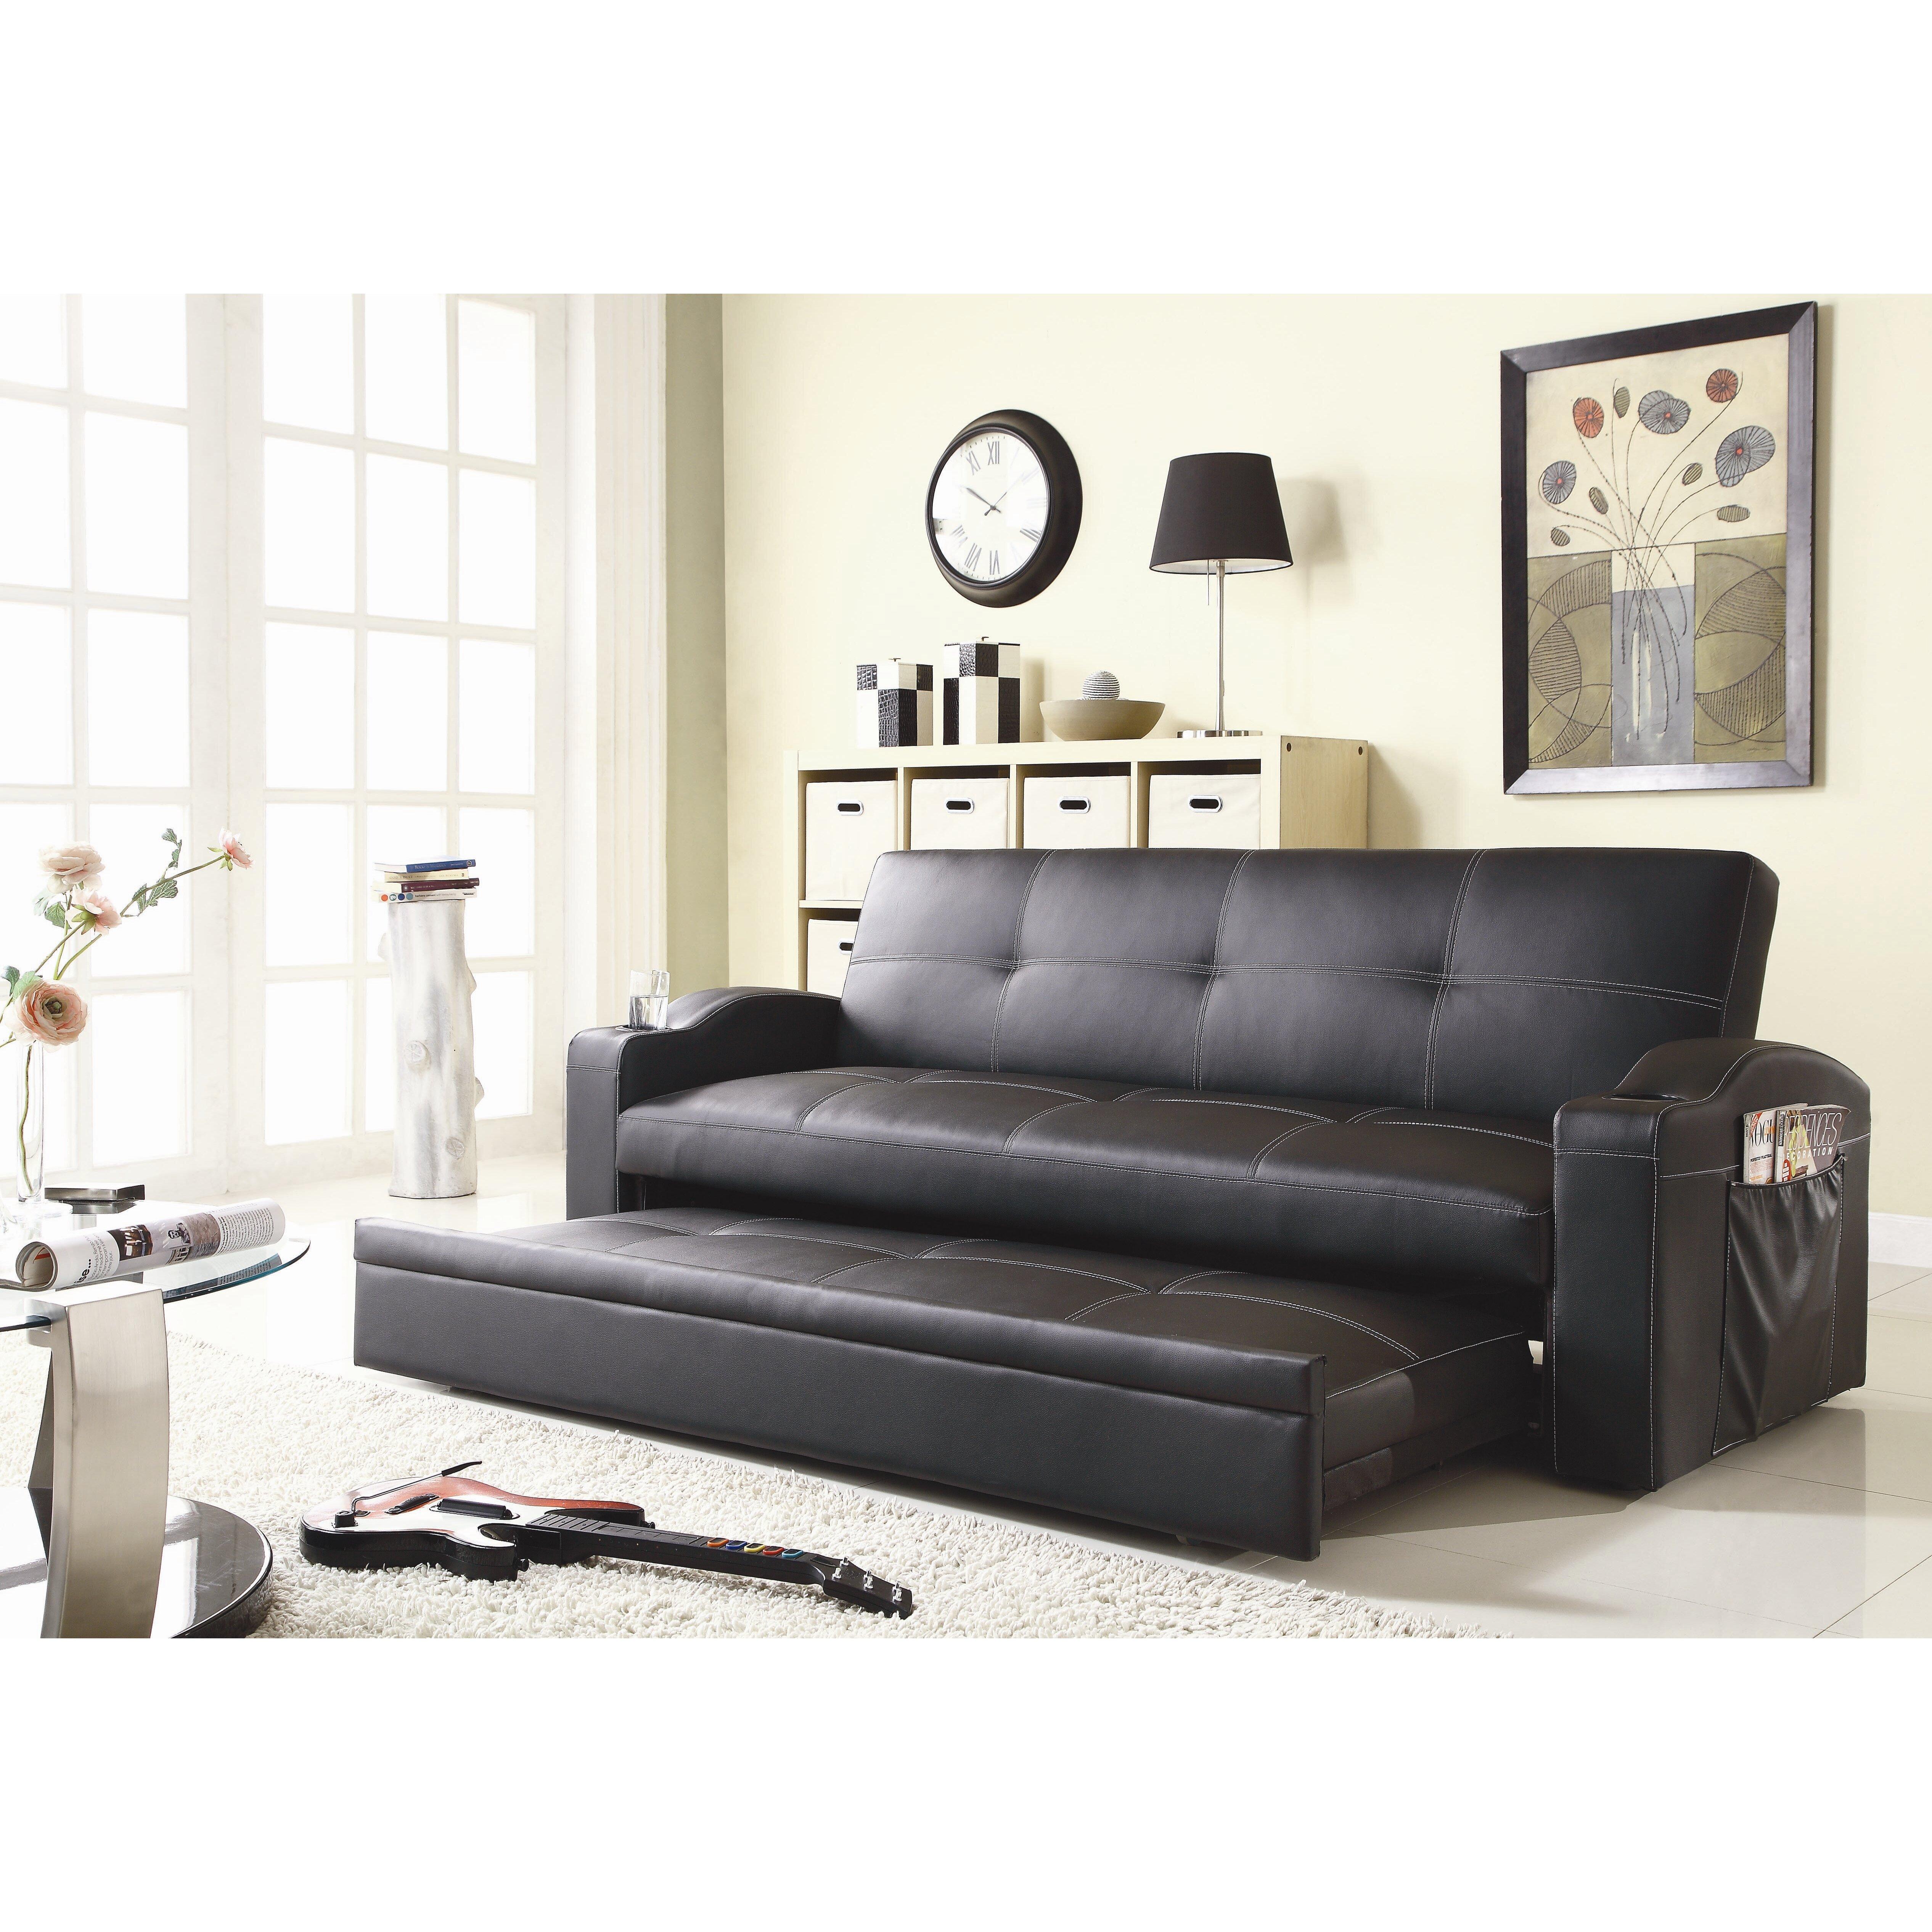 Woodhaven Hill Novak Sleeper Sofa u0026 Reviews : Wayfair